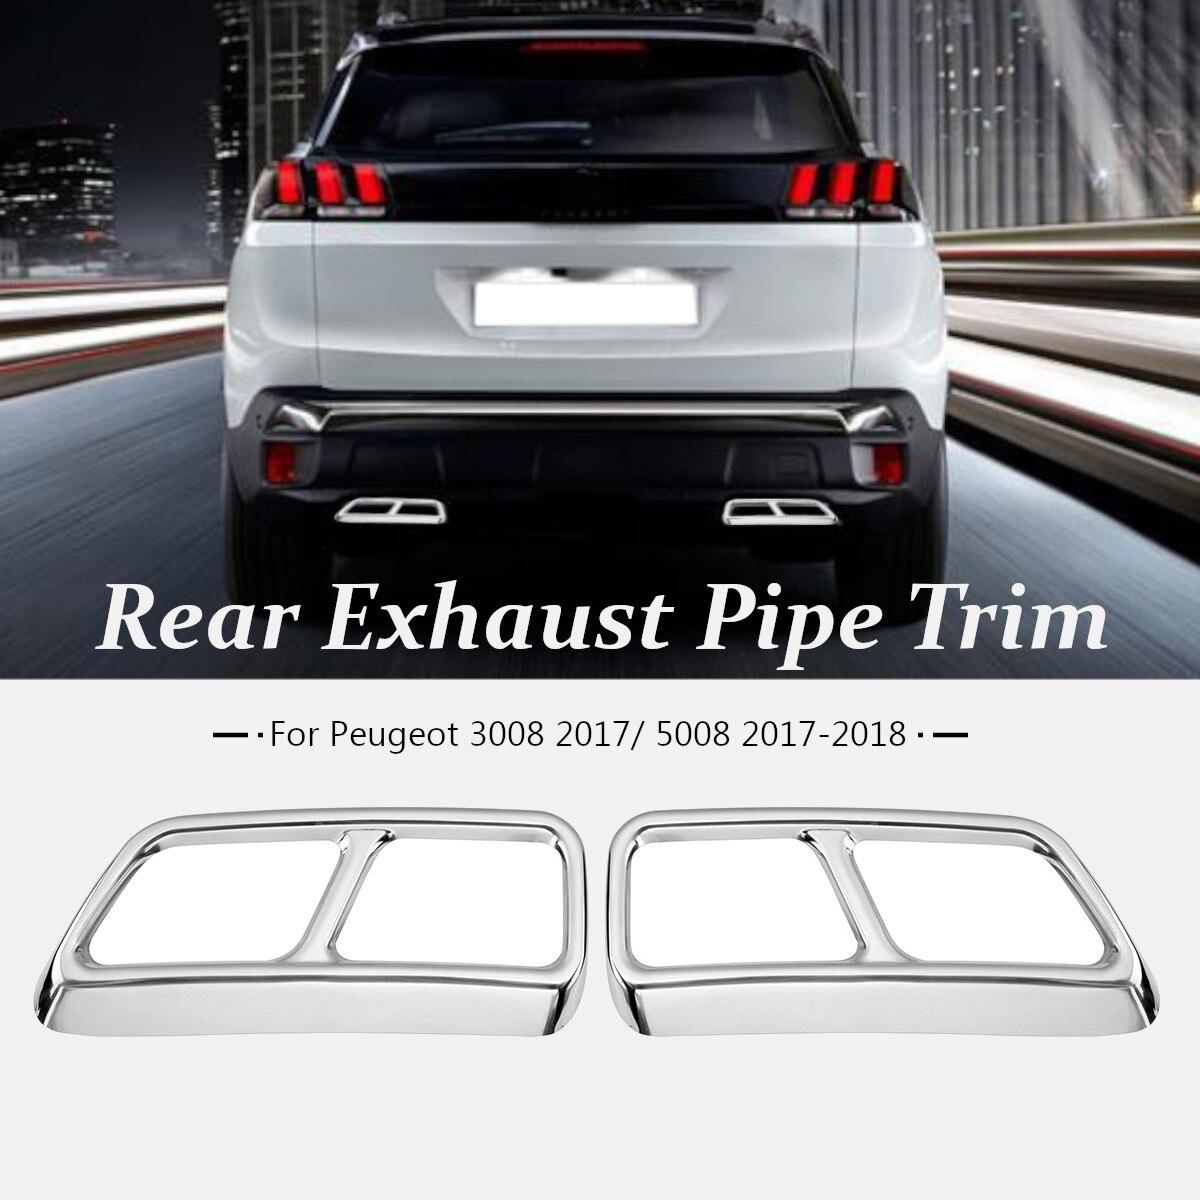 2Pcs/set Rear Exhaust Muffler Pipe Cover Trim Decoration For Peugeot 3008 2017 / 5008 2017 2018 for peugeot 3008 5008 2017 2pcs set rear exhaust muffler pipe cover trim decoration